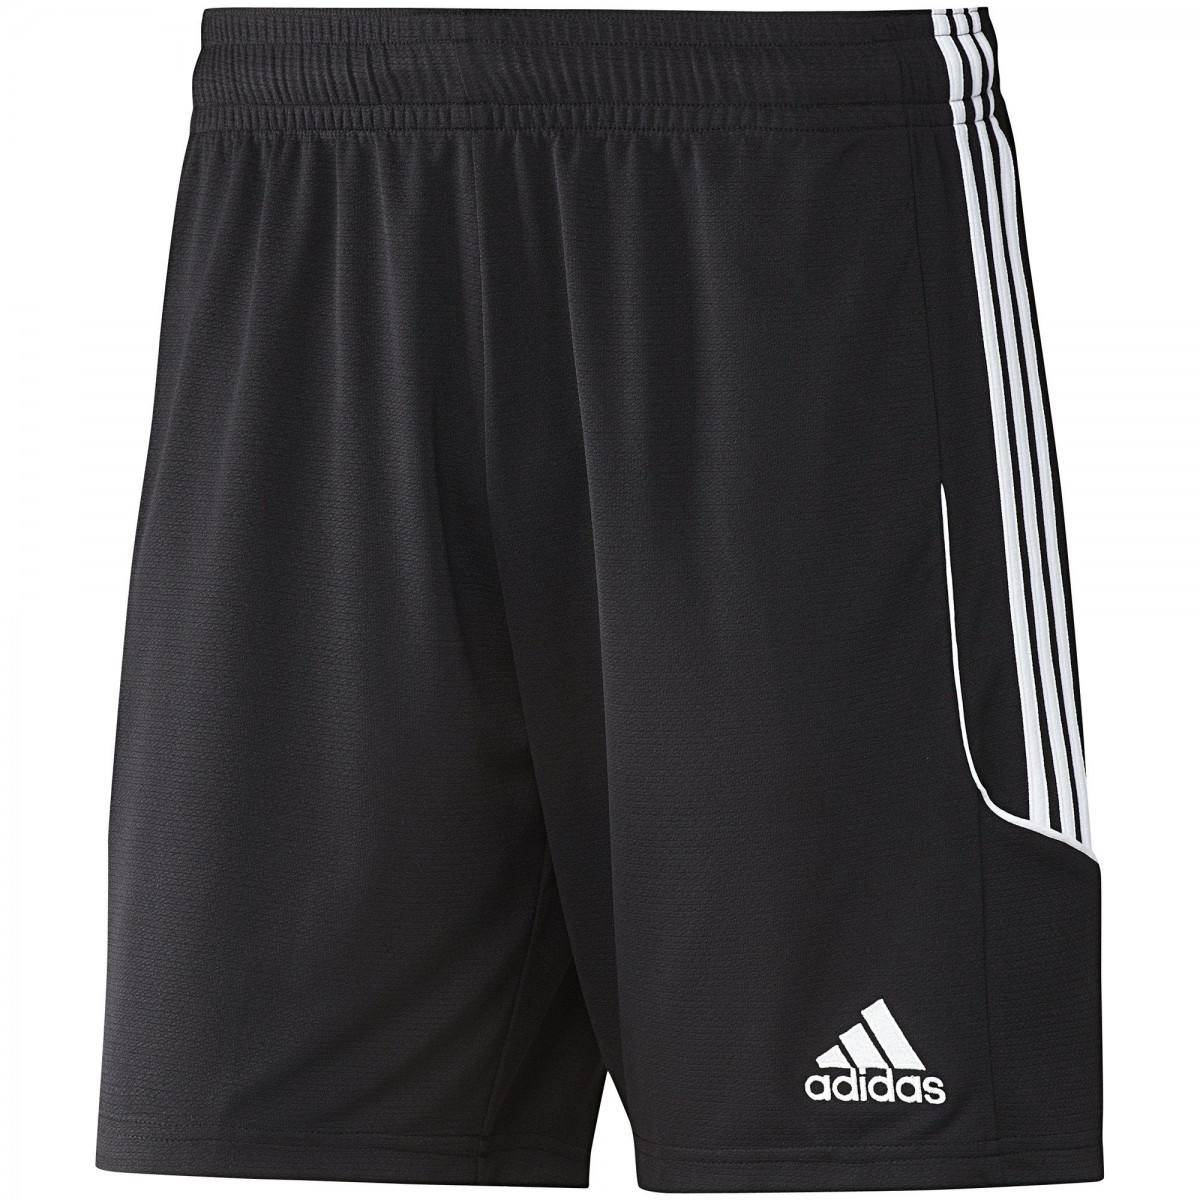 b364c1fd31 Bizz Store - Shorts Masculino Adidas Squadra 13 Preto Climalite